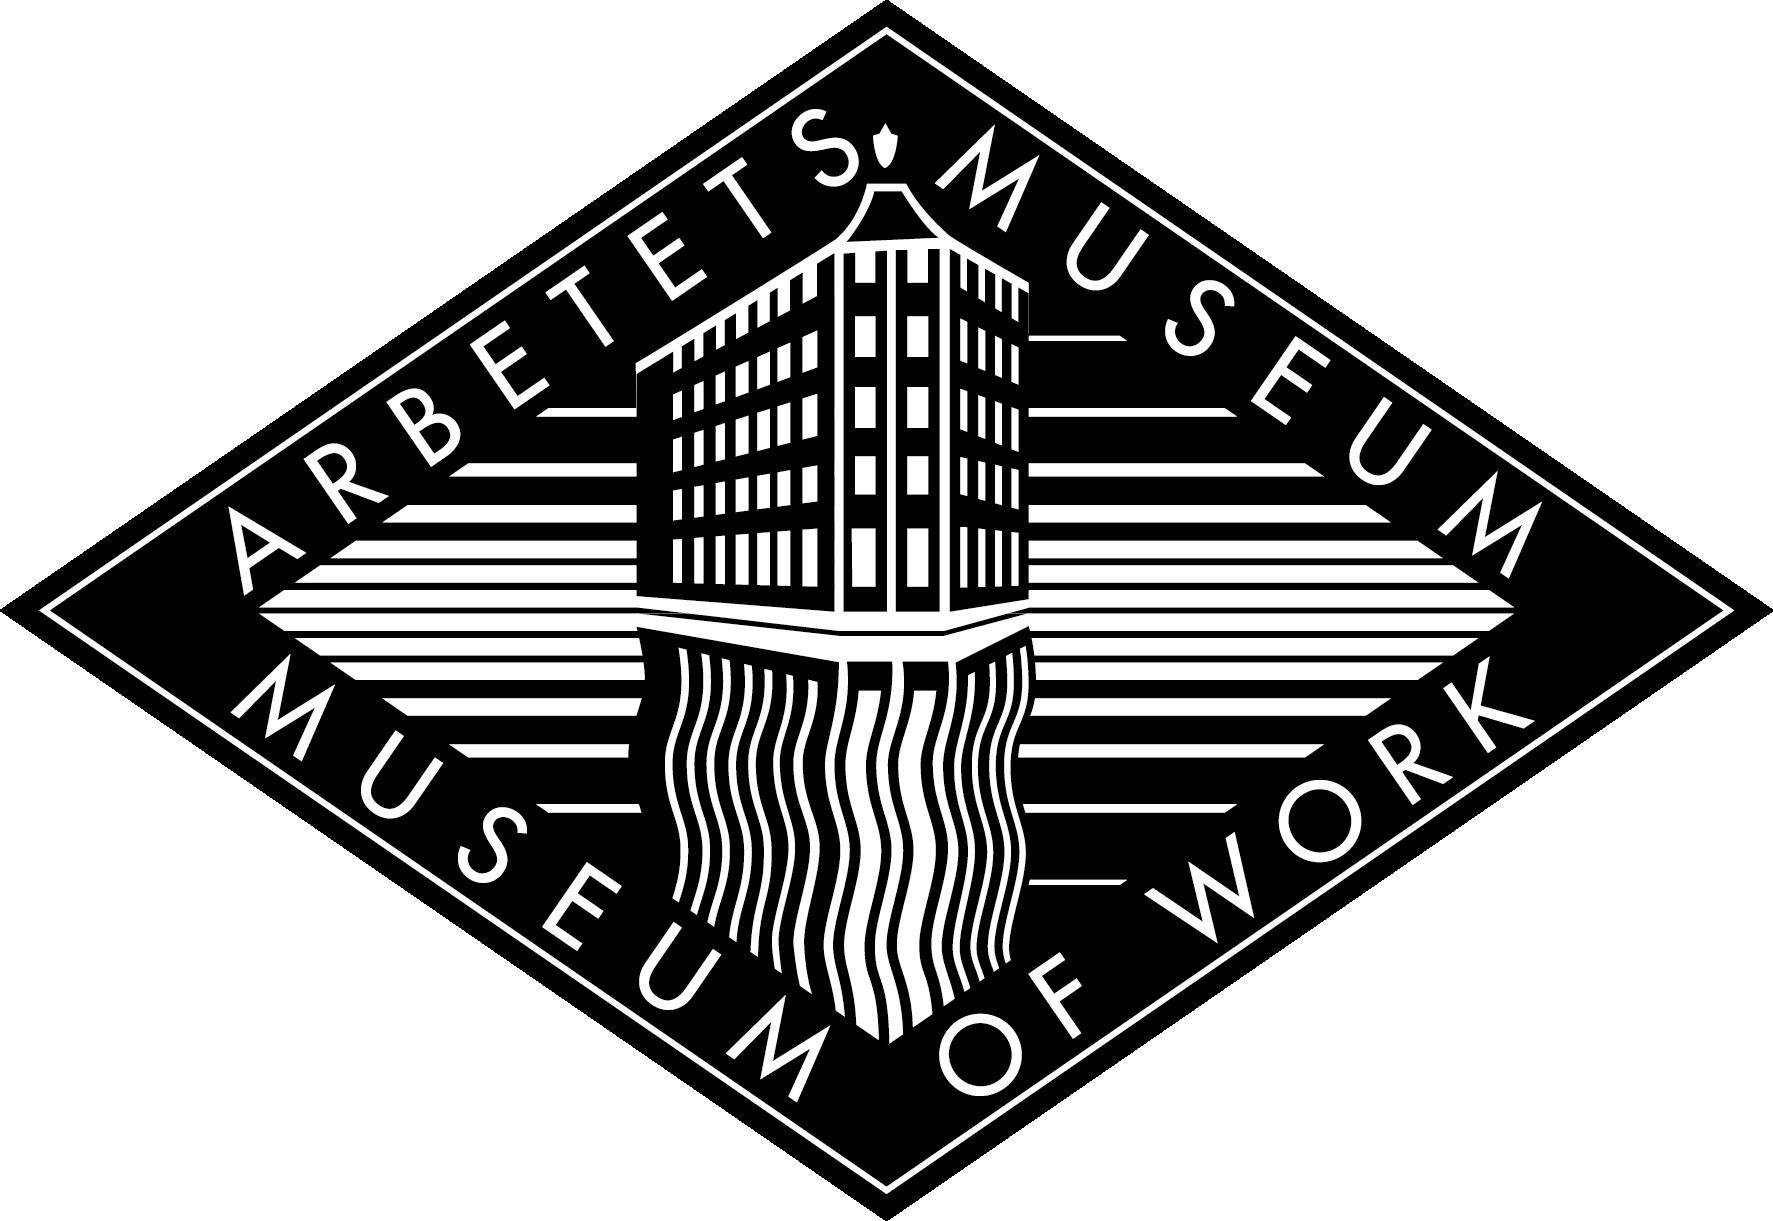 arbetets_museum_logo.png